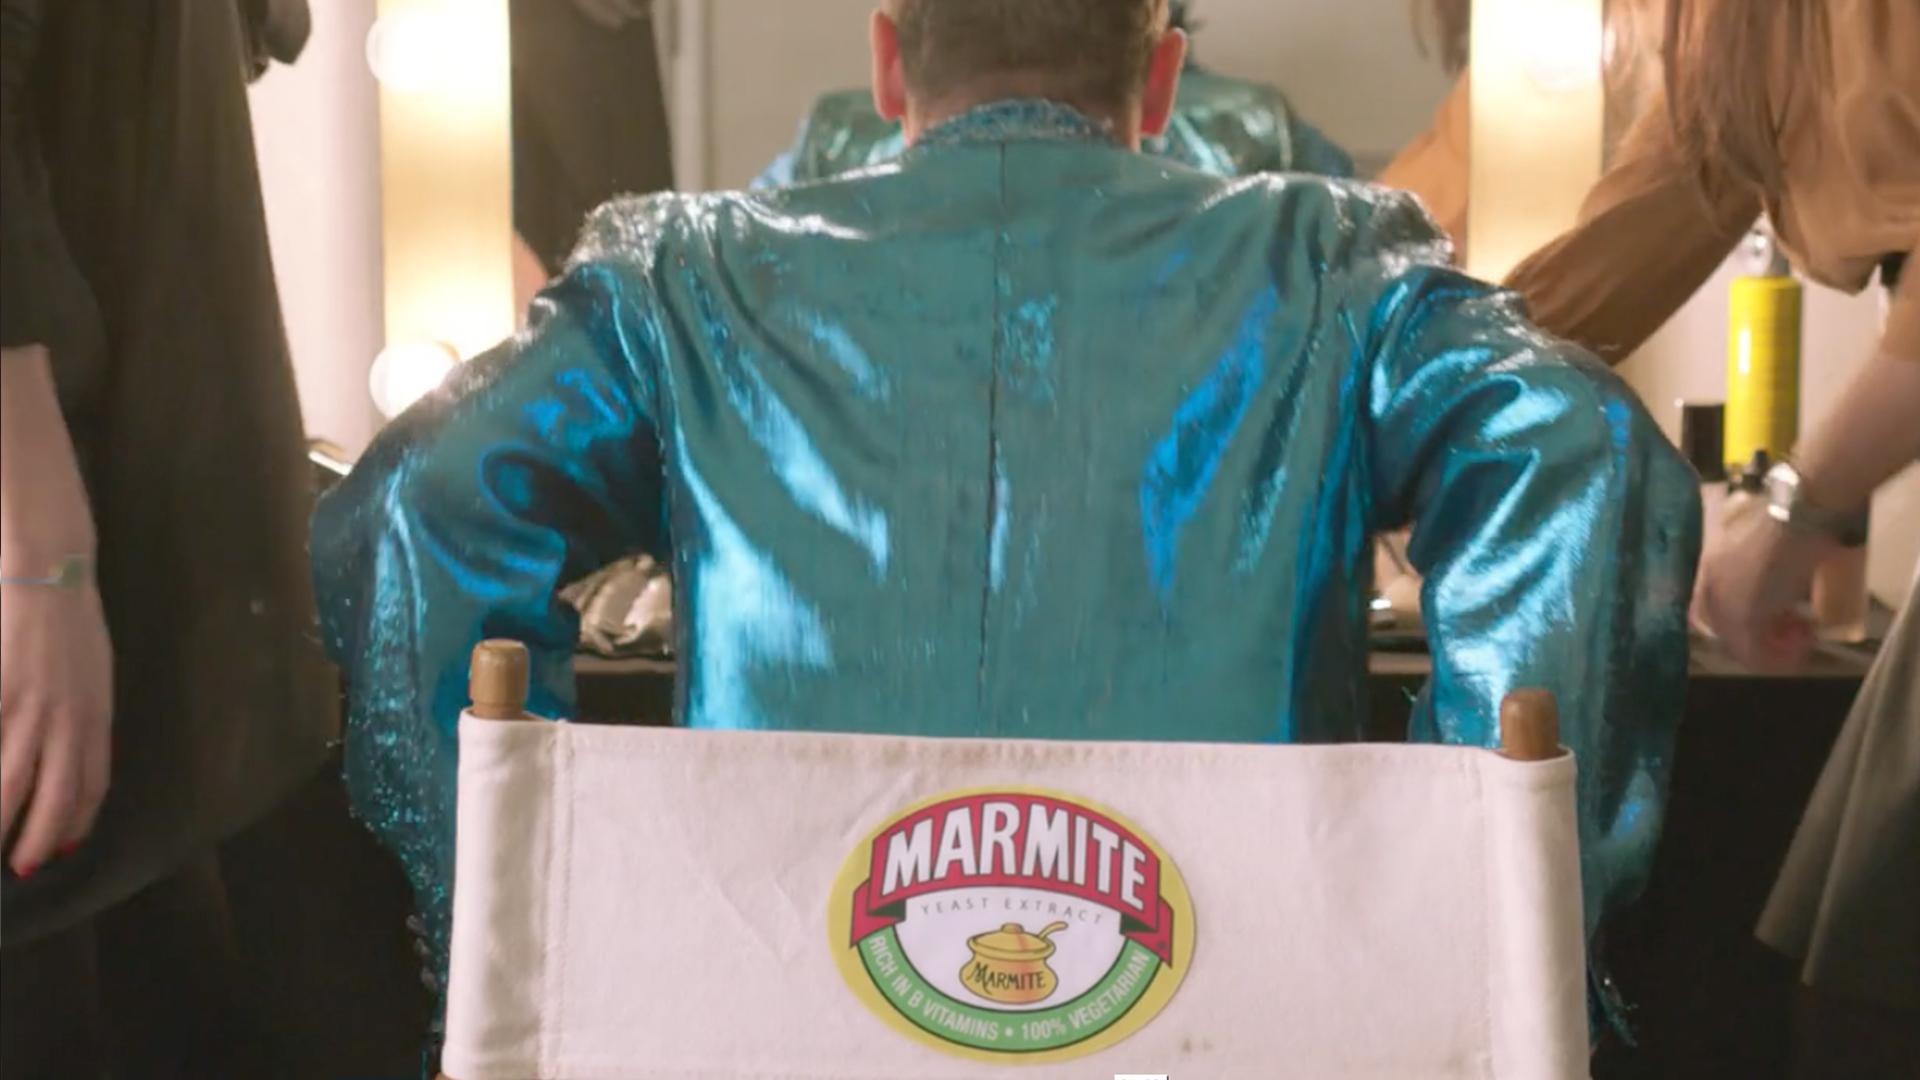 marmite8